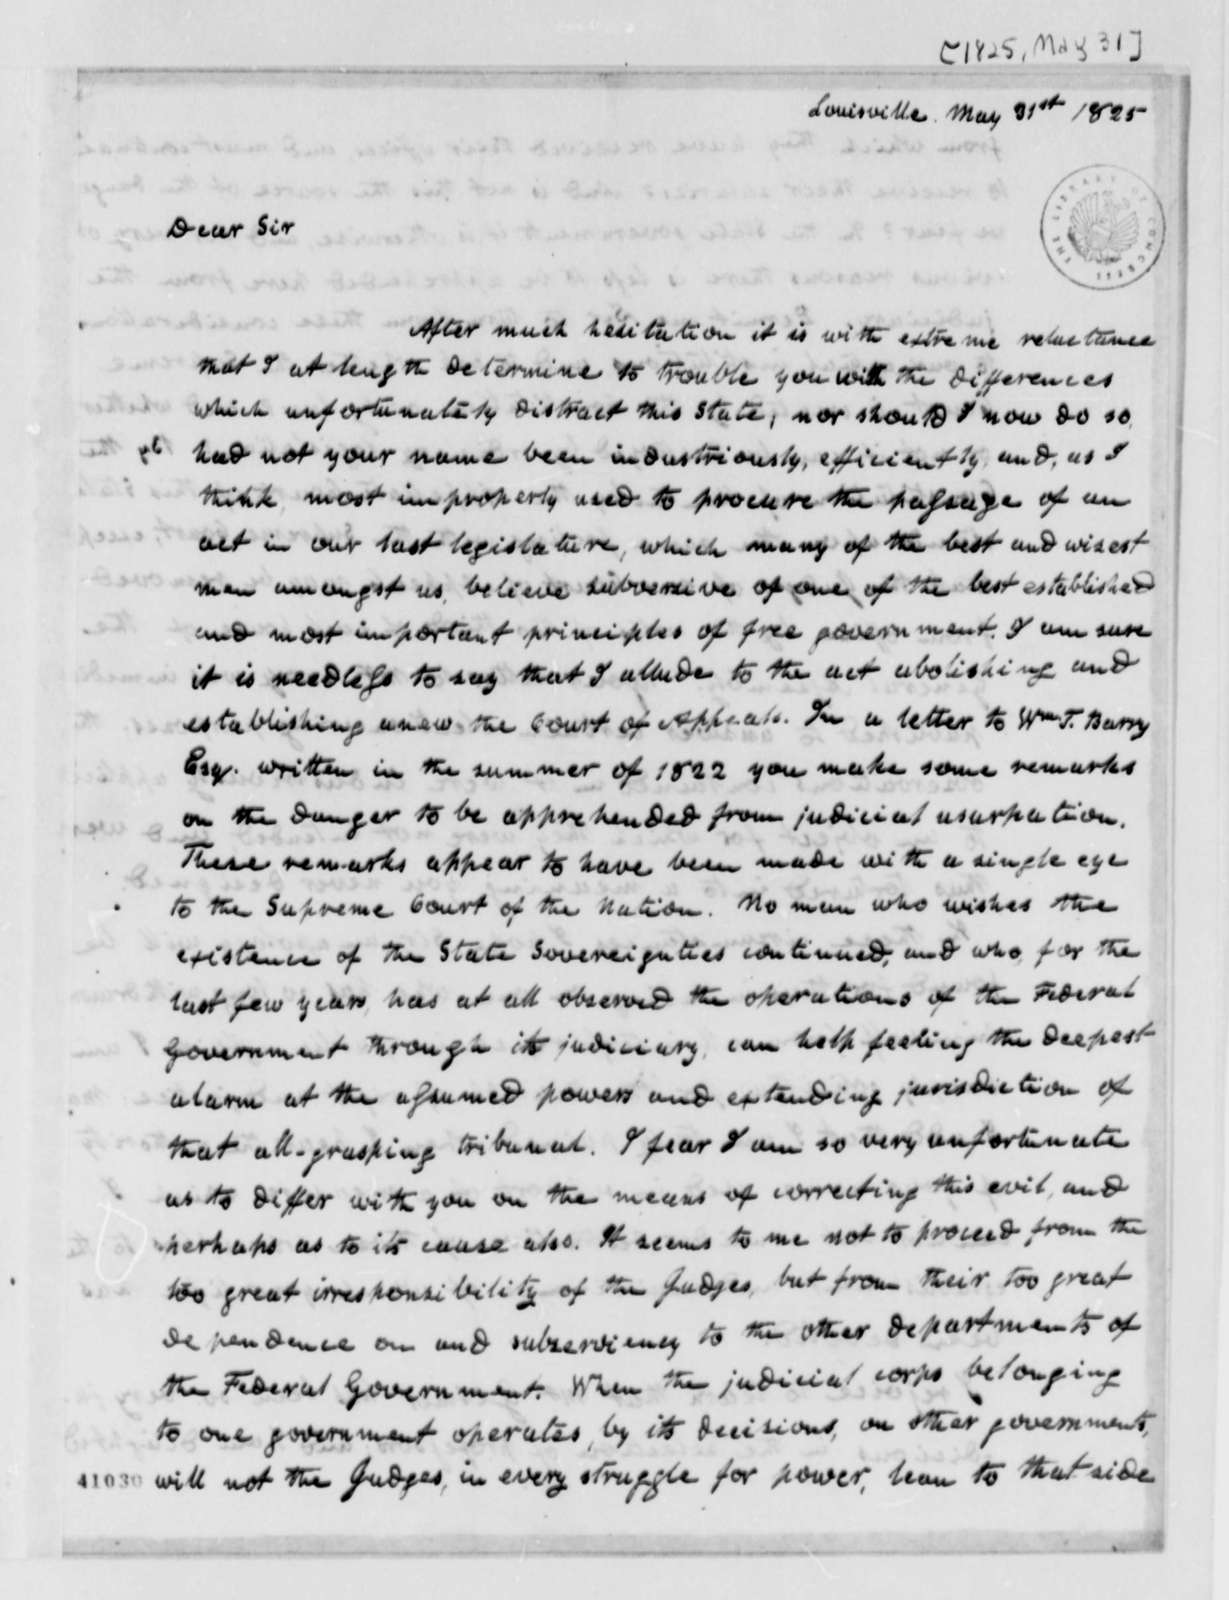 Dabney Carr Terrell to Thomas Jefferson, May 31, 1825